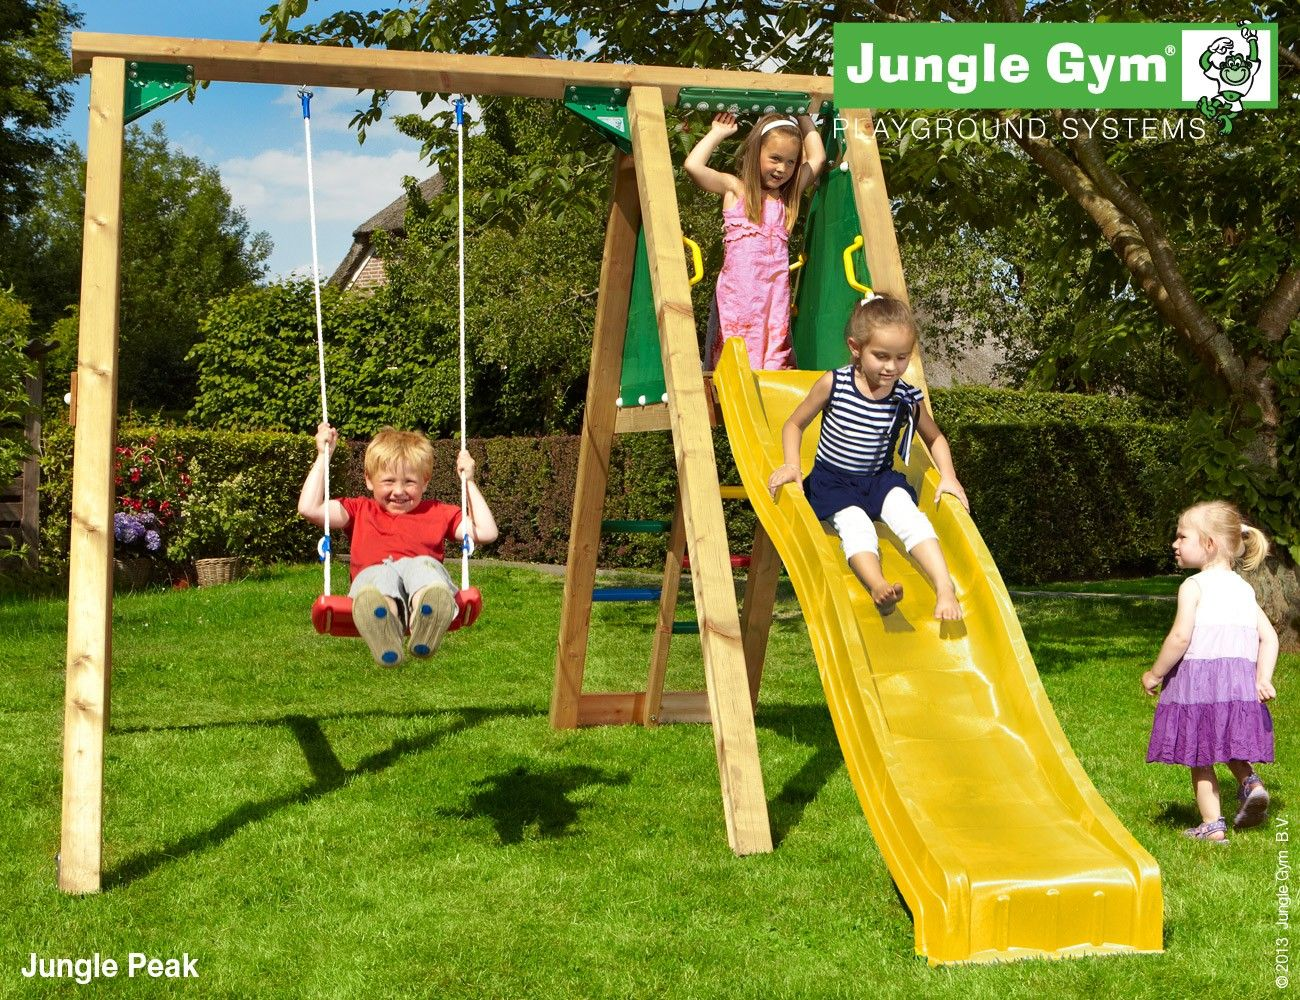 Swing set by Jungle Gym - Jungle Peak | Accessories | Pinterest